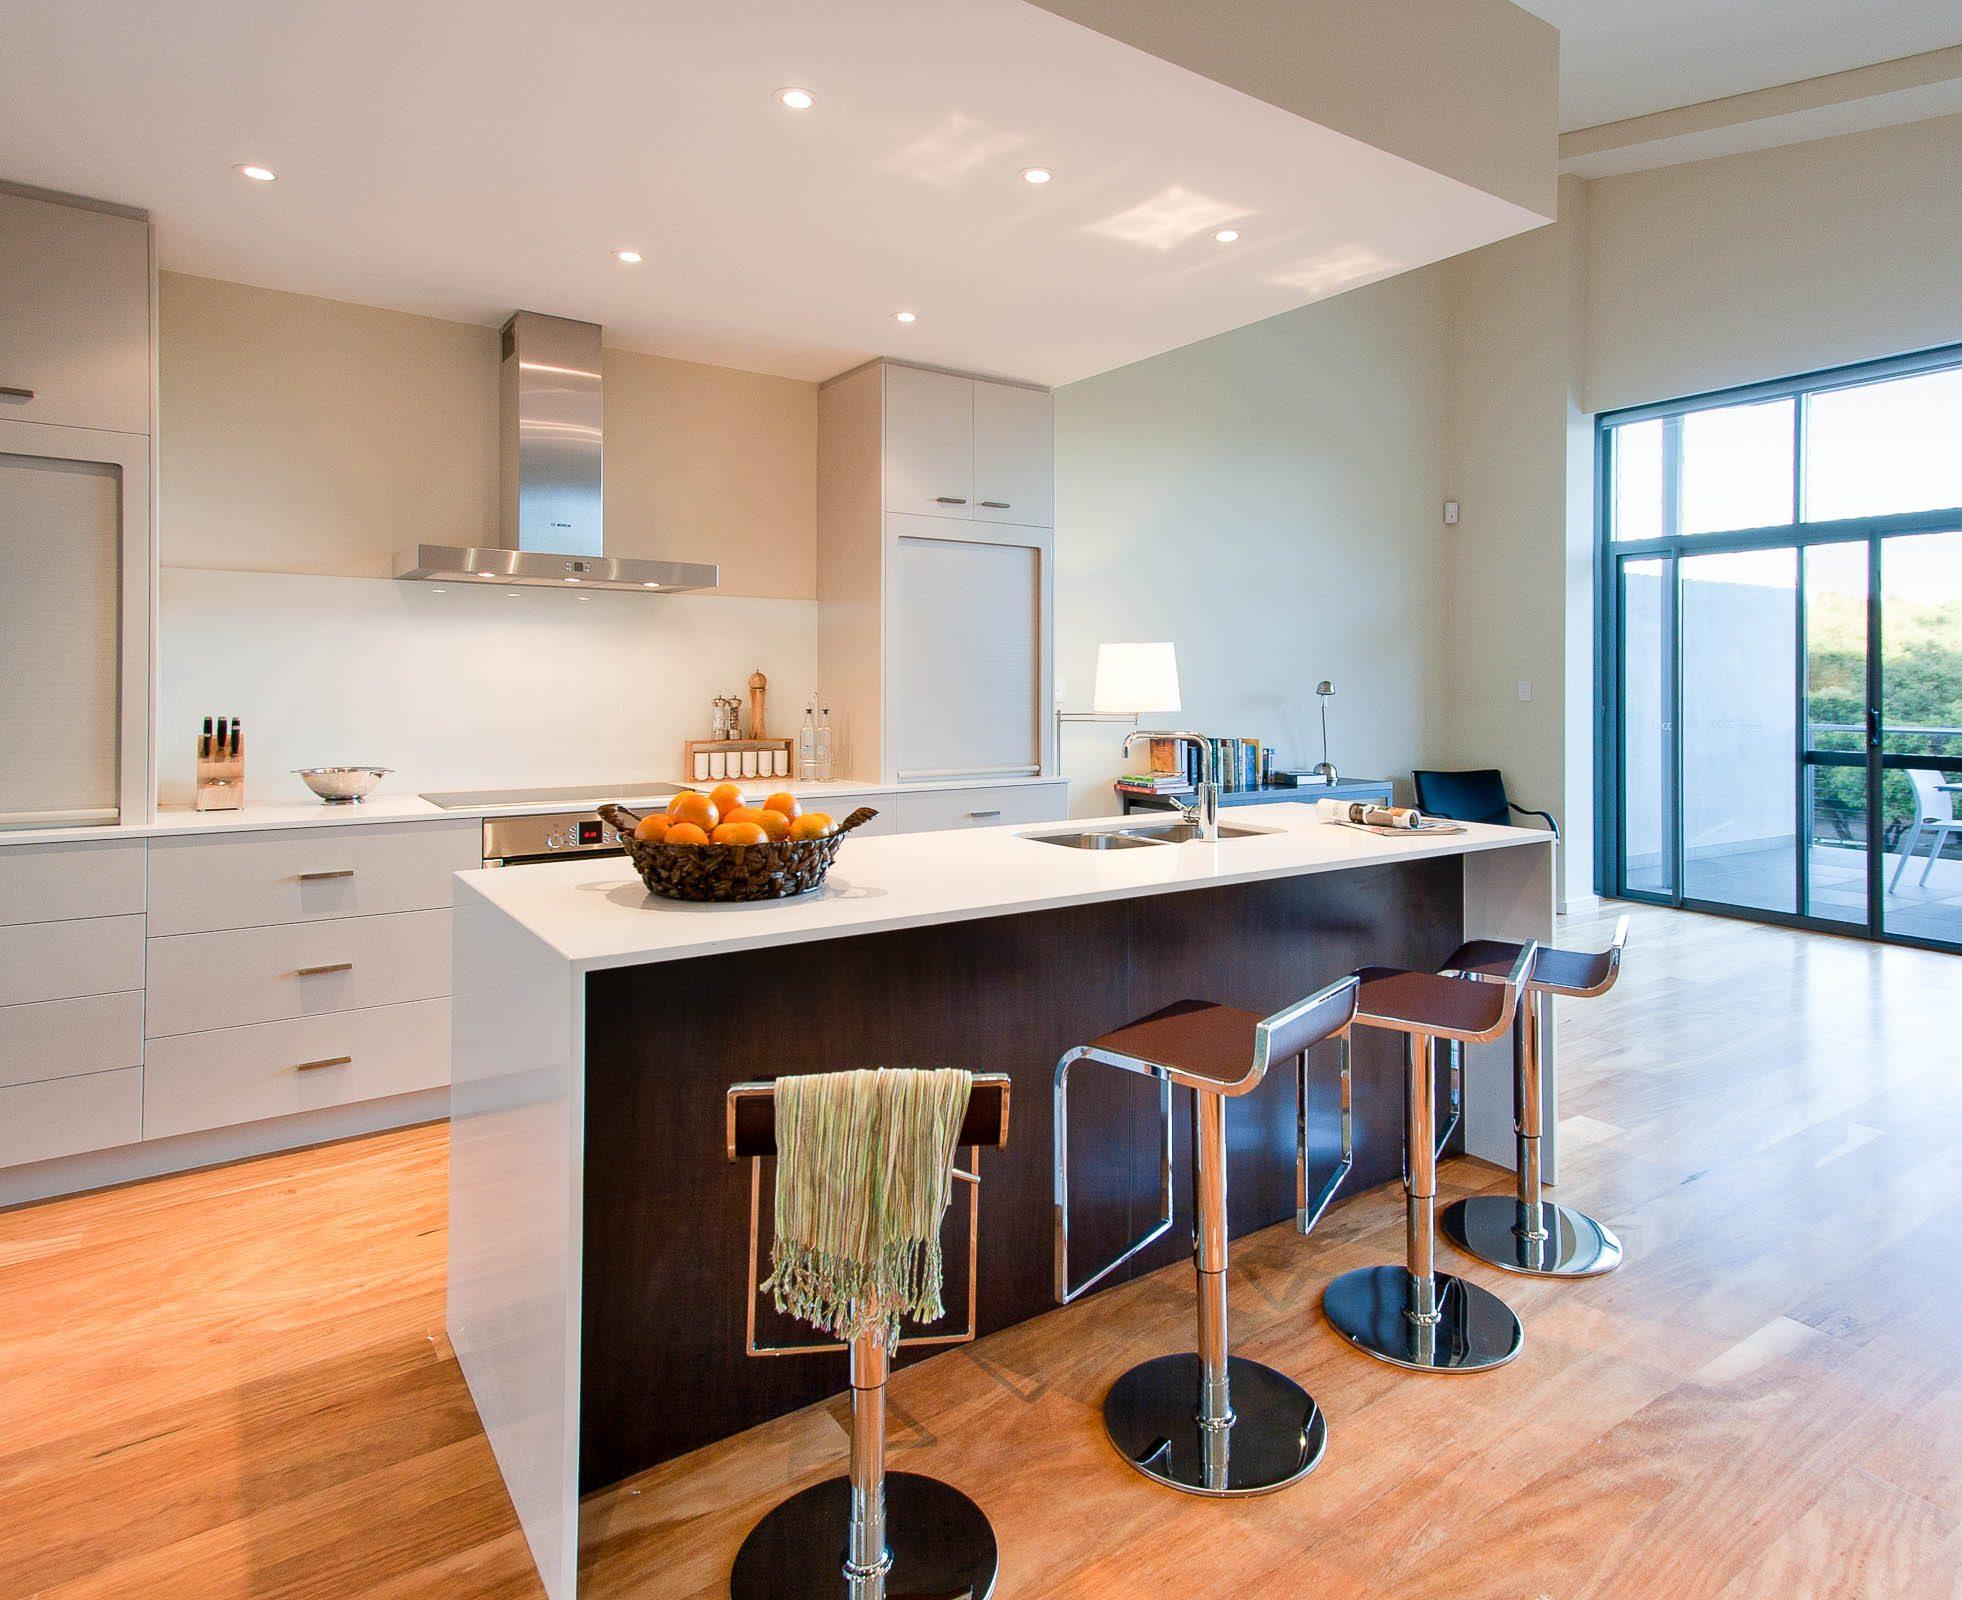 12-100159-EAGLE ESCAPE-kitchen 2